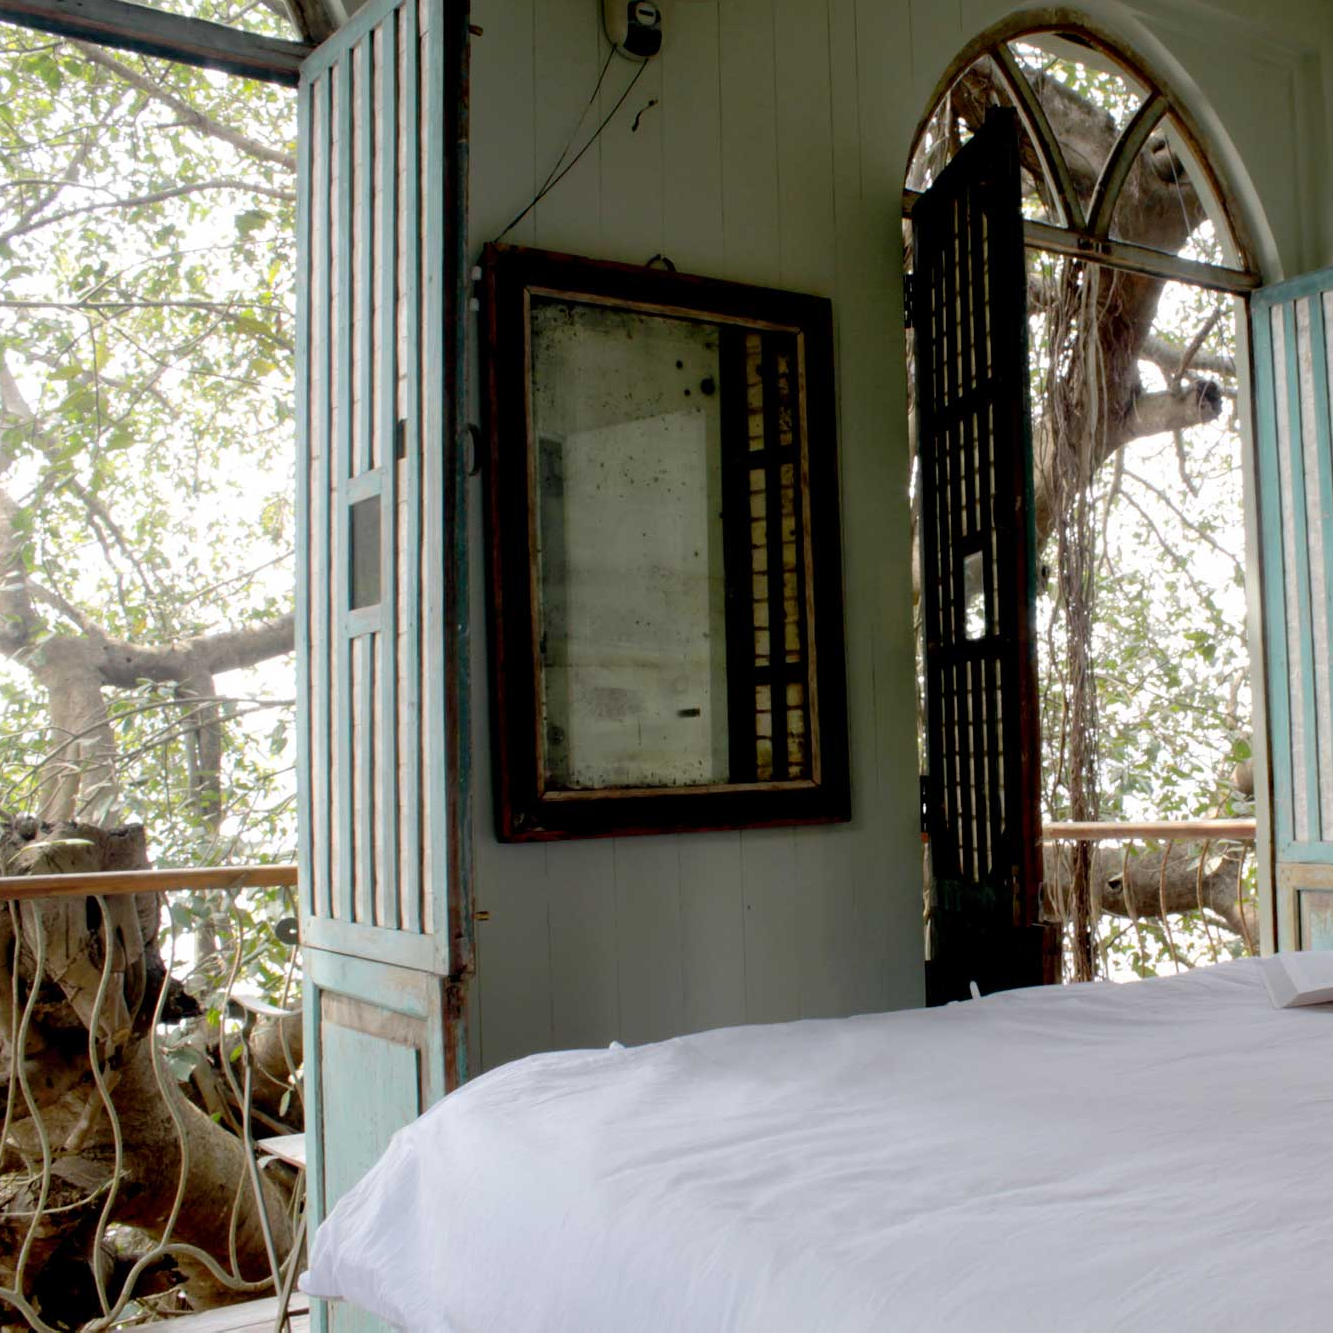 Arjun's Tree House